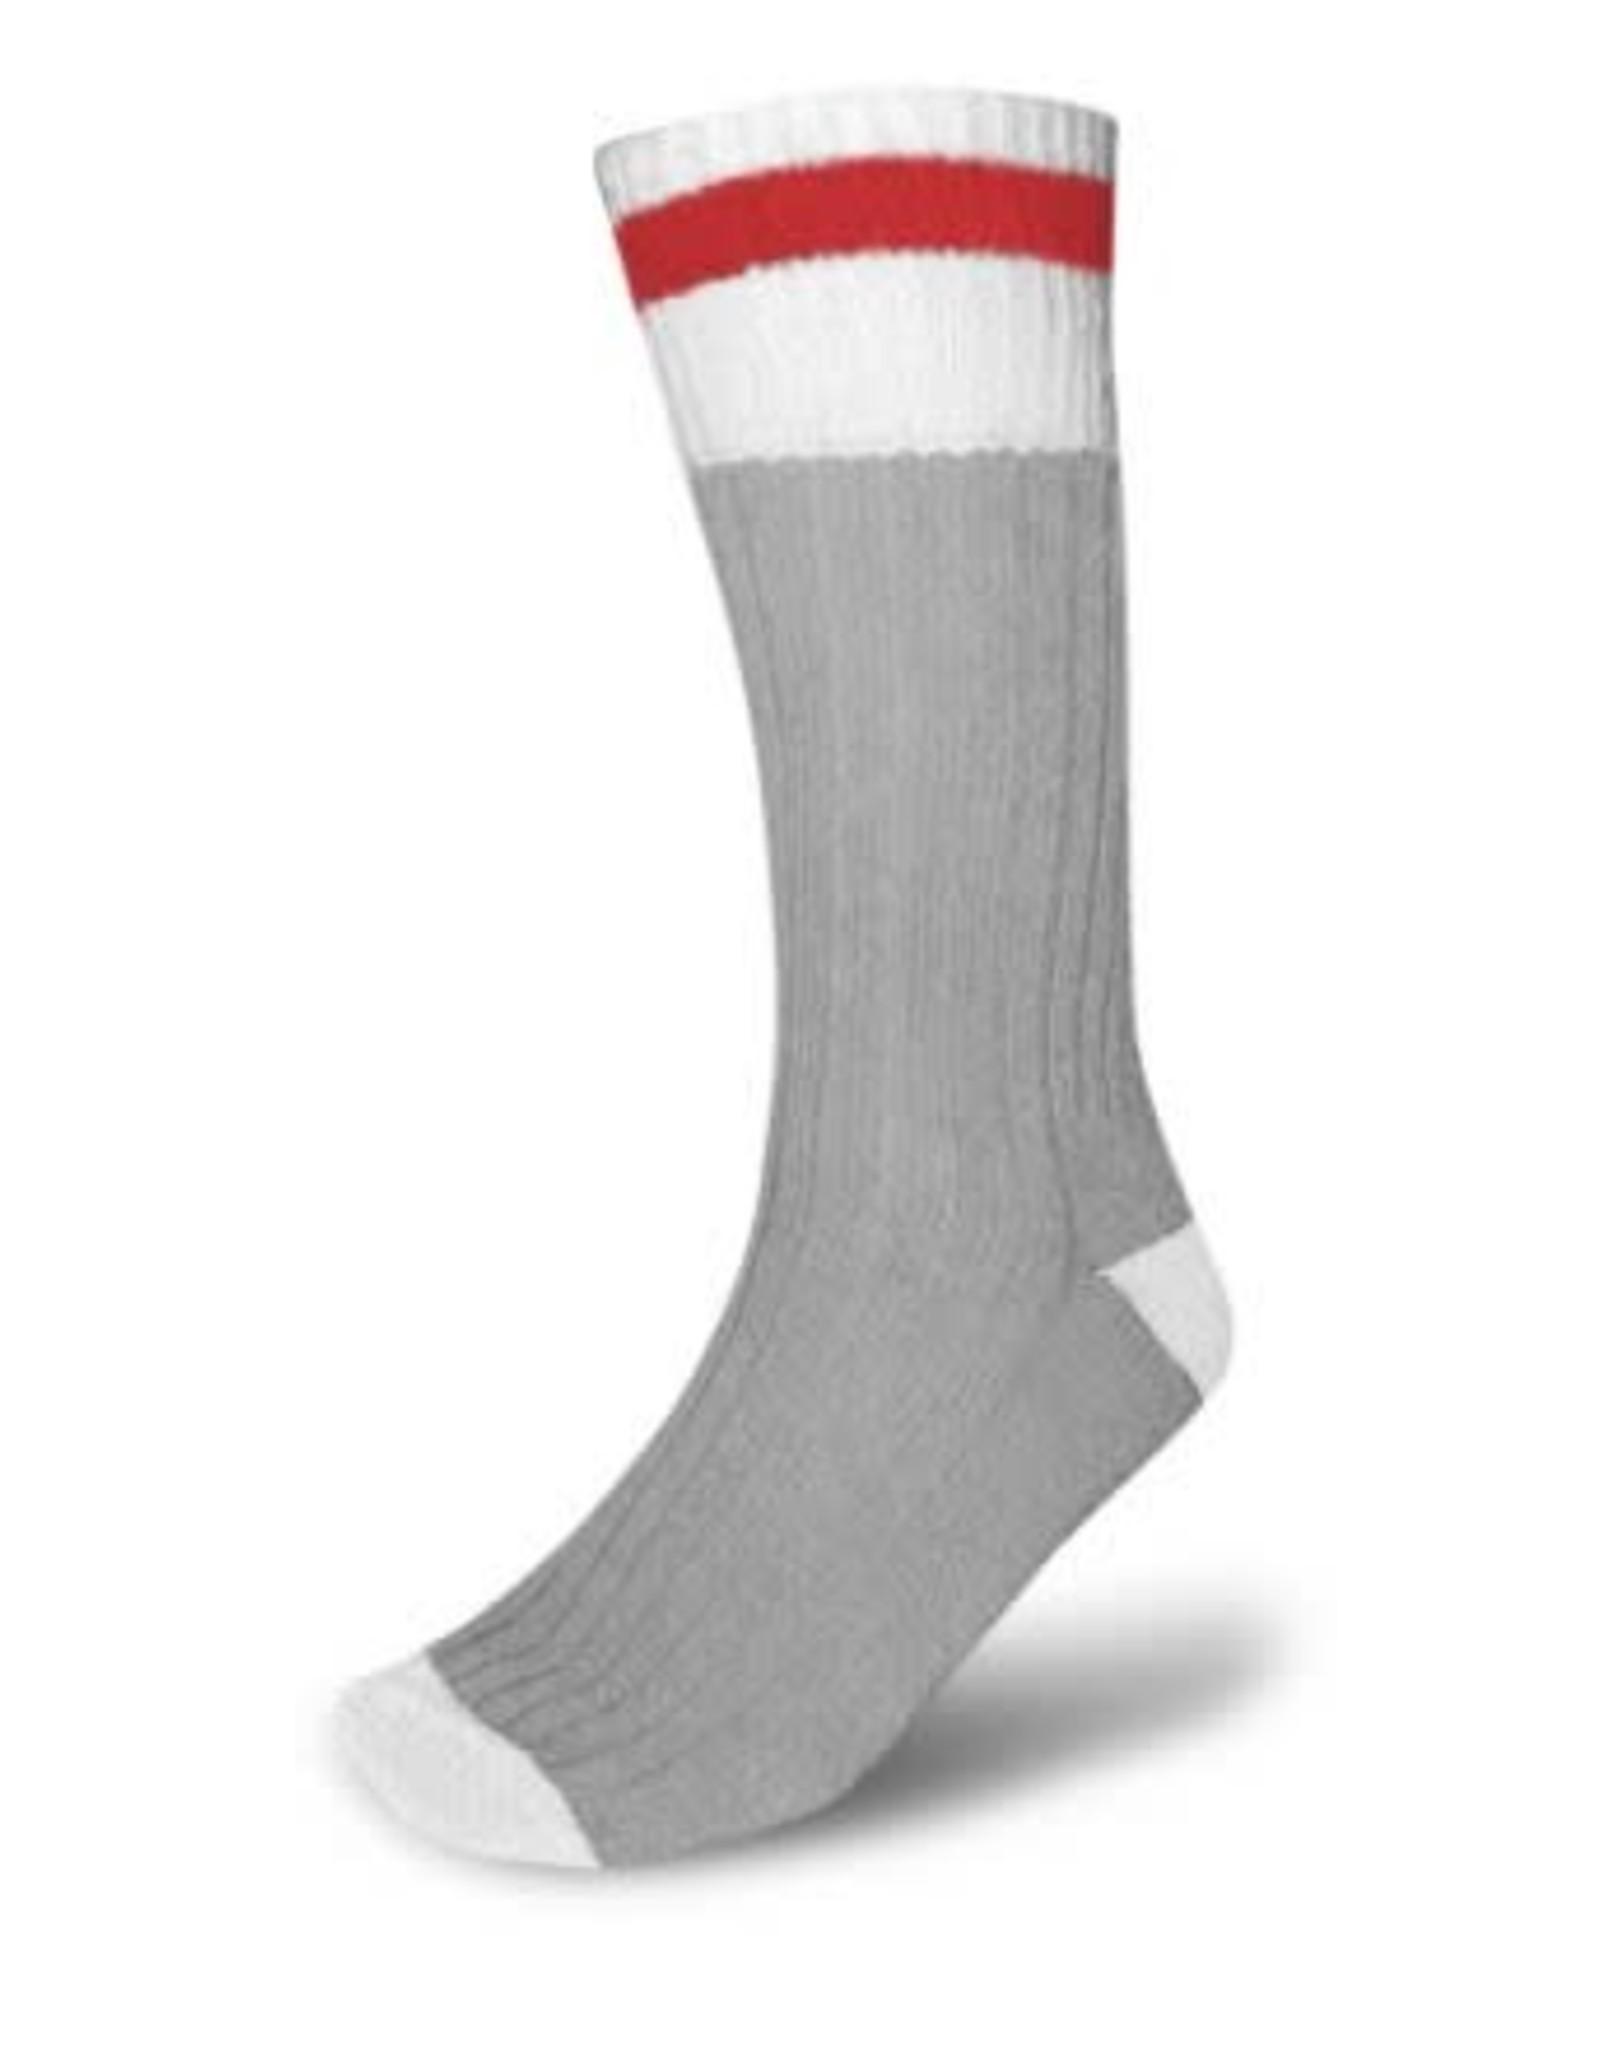 Pook Pook Classic Sock